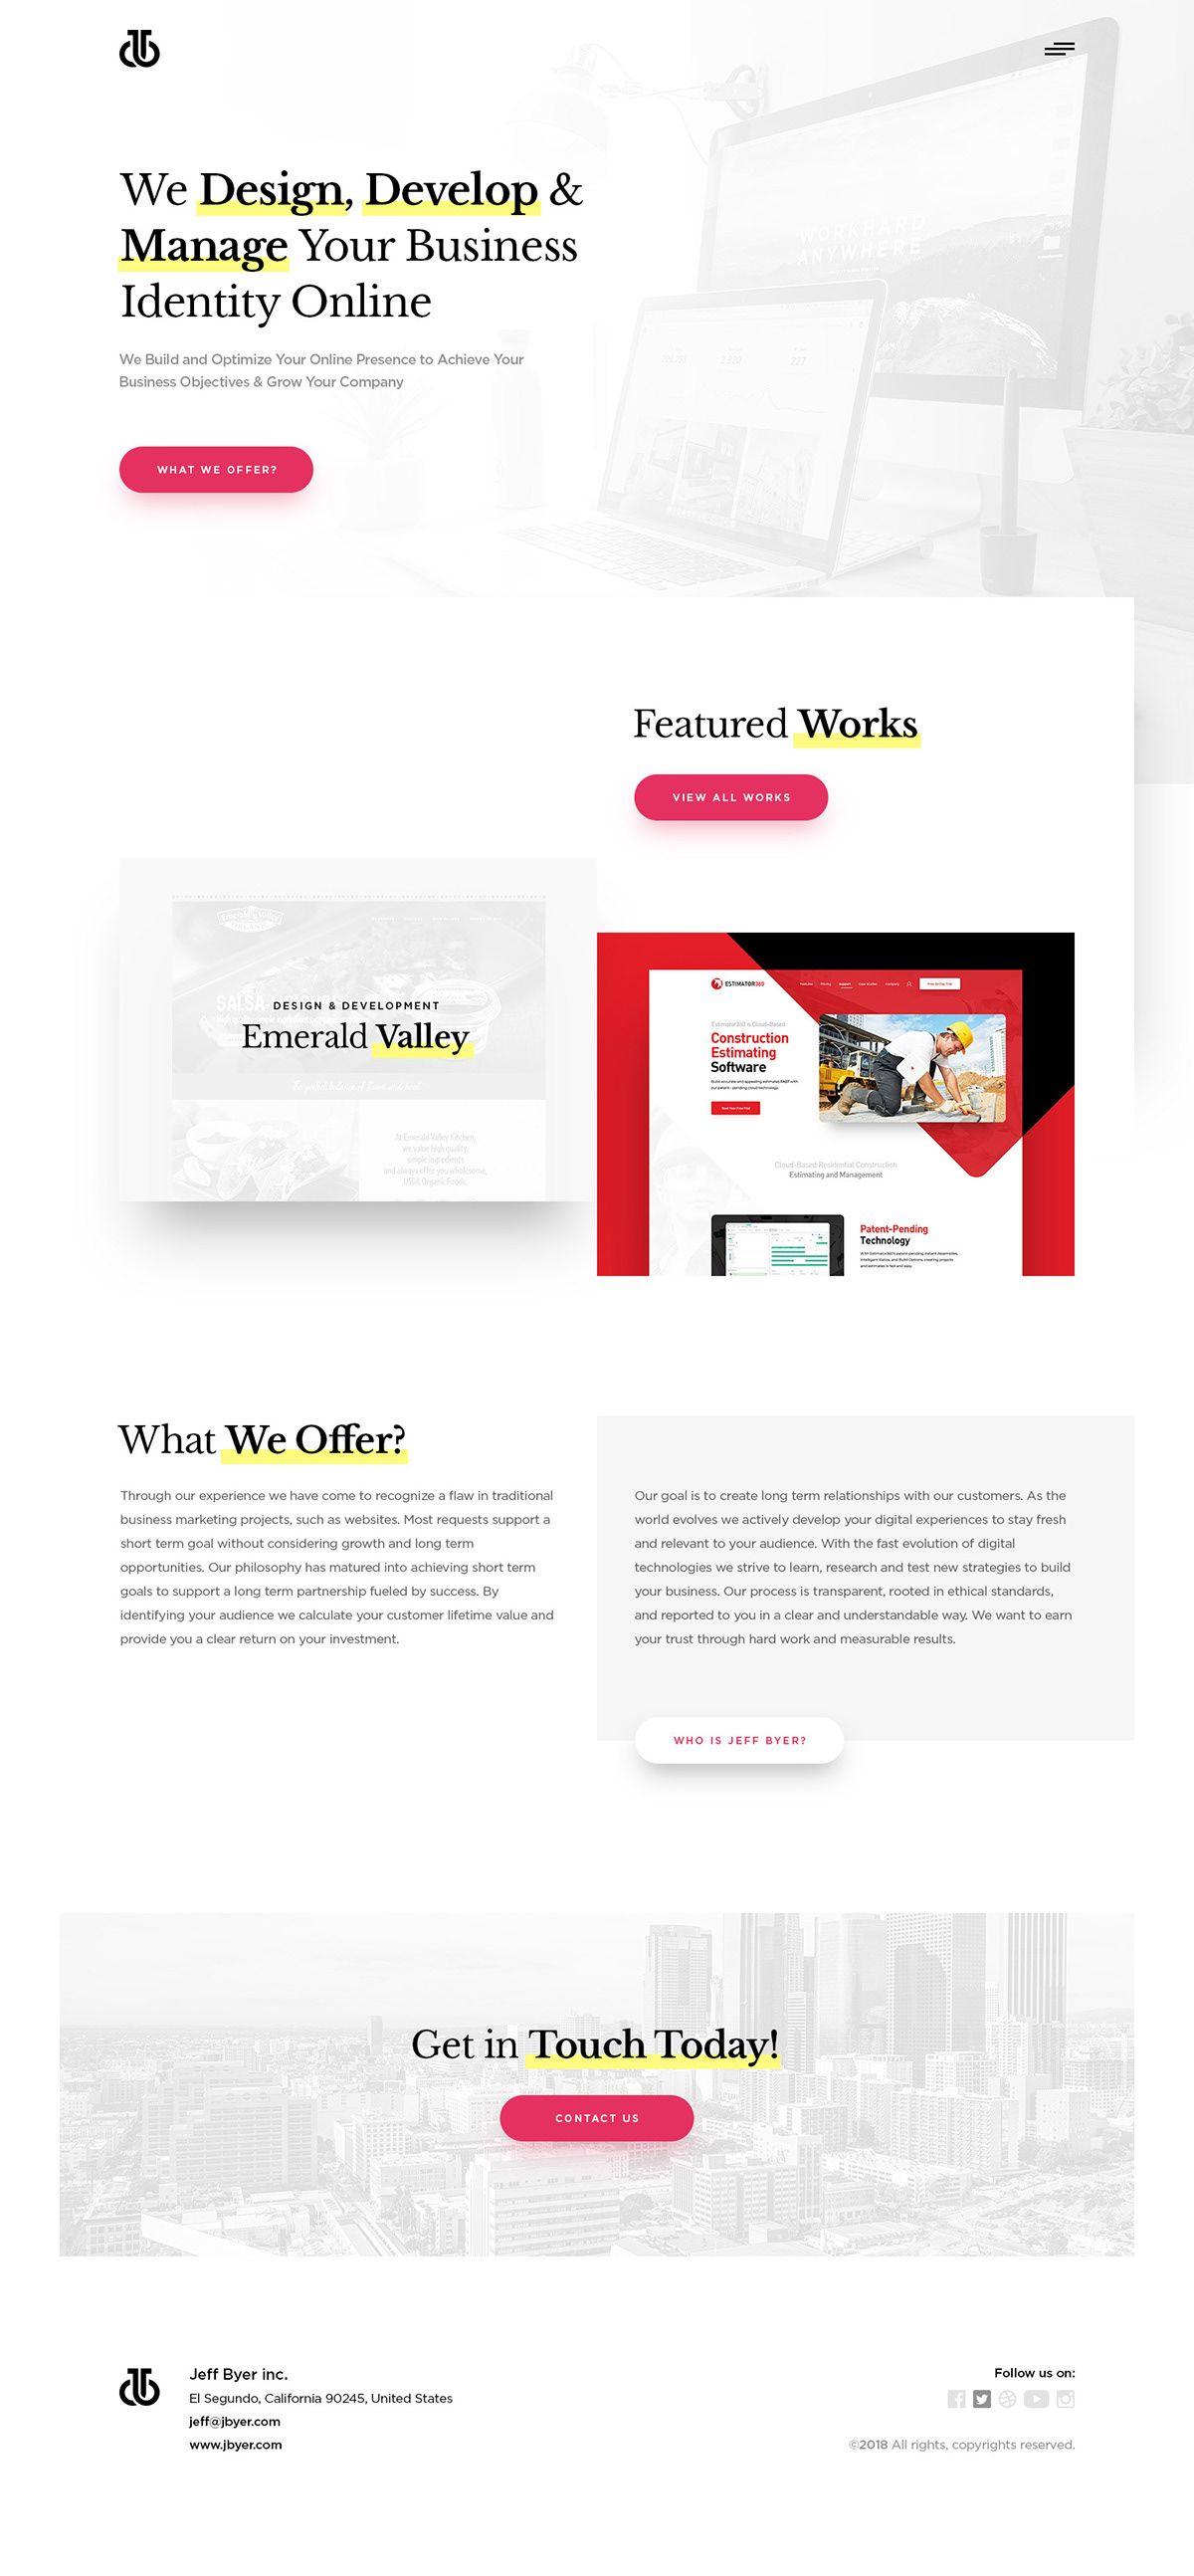 2018 Web Design On Behance Web Design Web Design Company Design